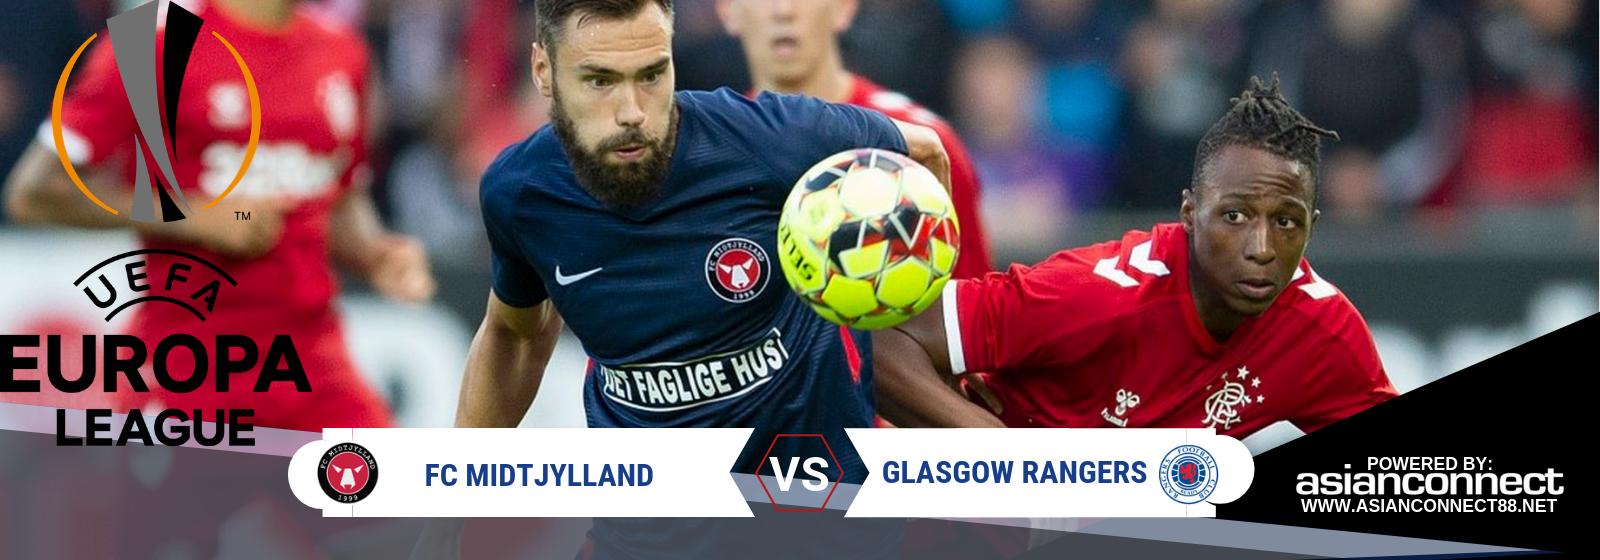 UEL FC Midtjylland Vs. Glasgow Rangers Asian Connect